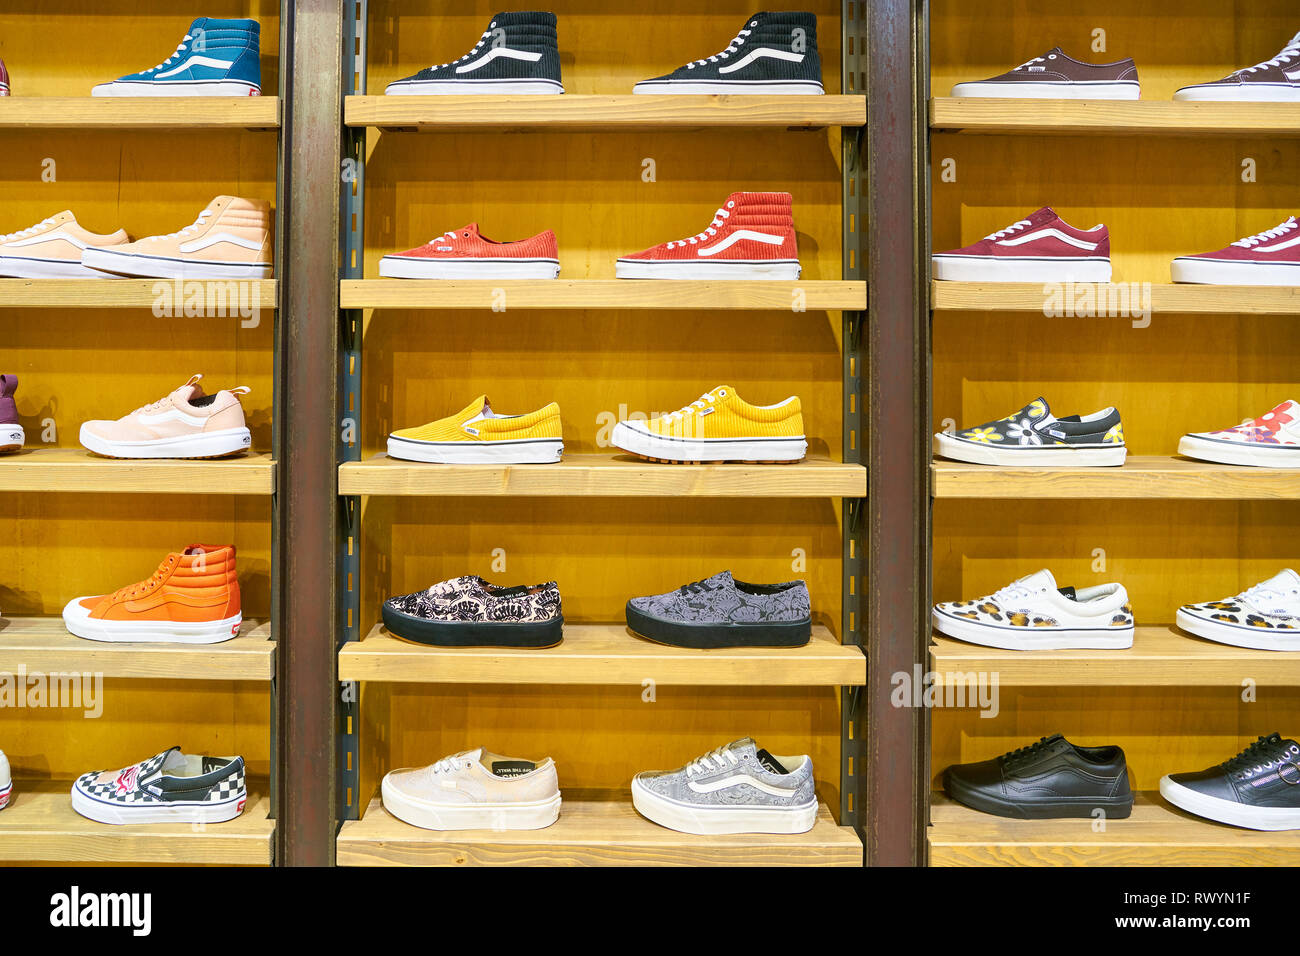 Get - vans westgate mall - OFF 65